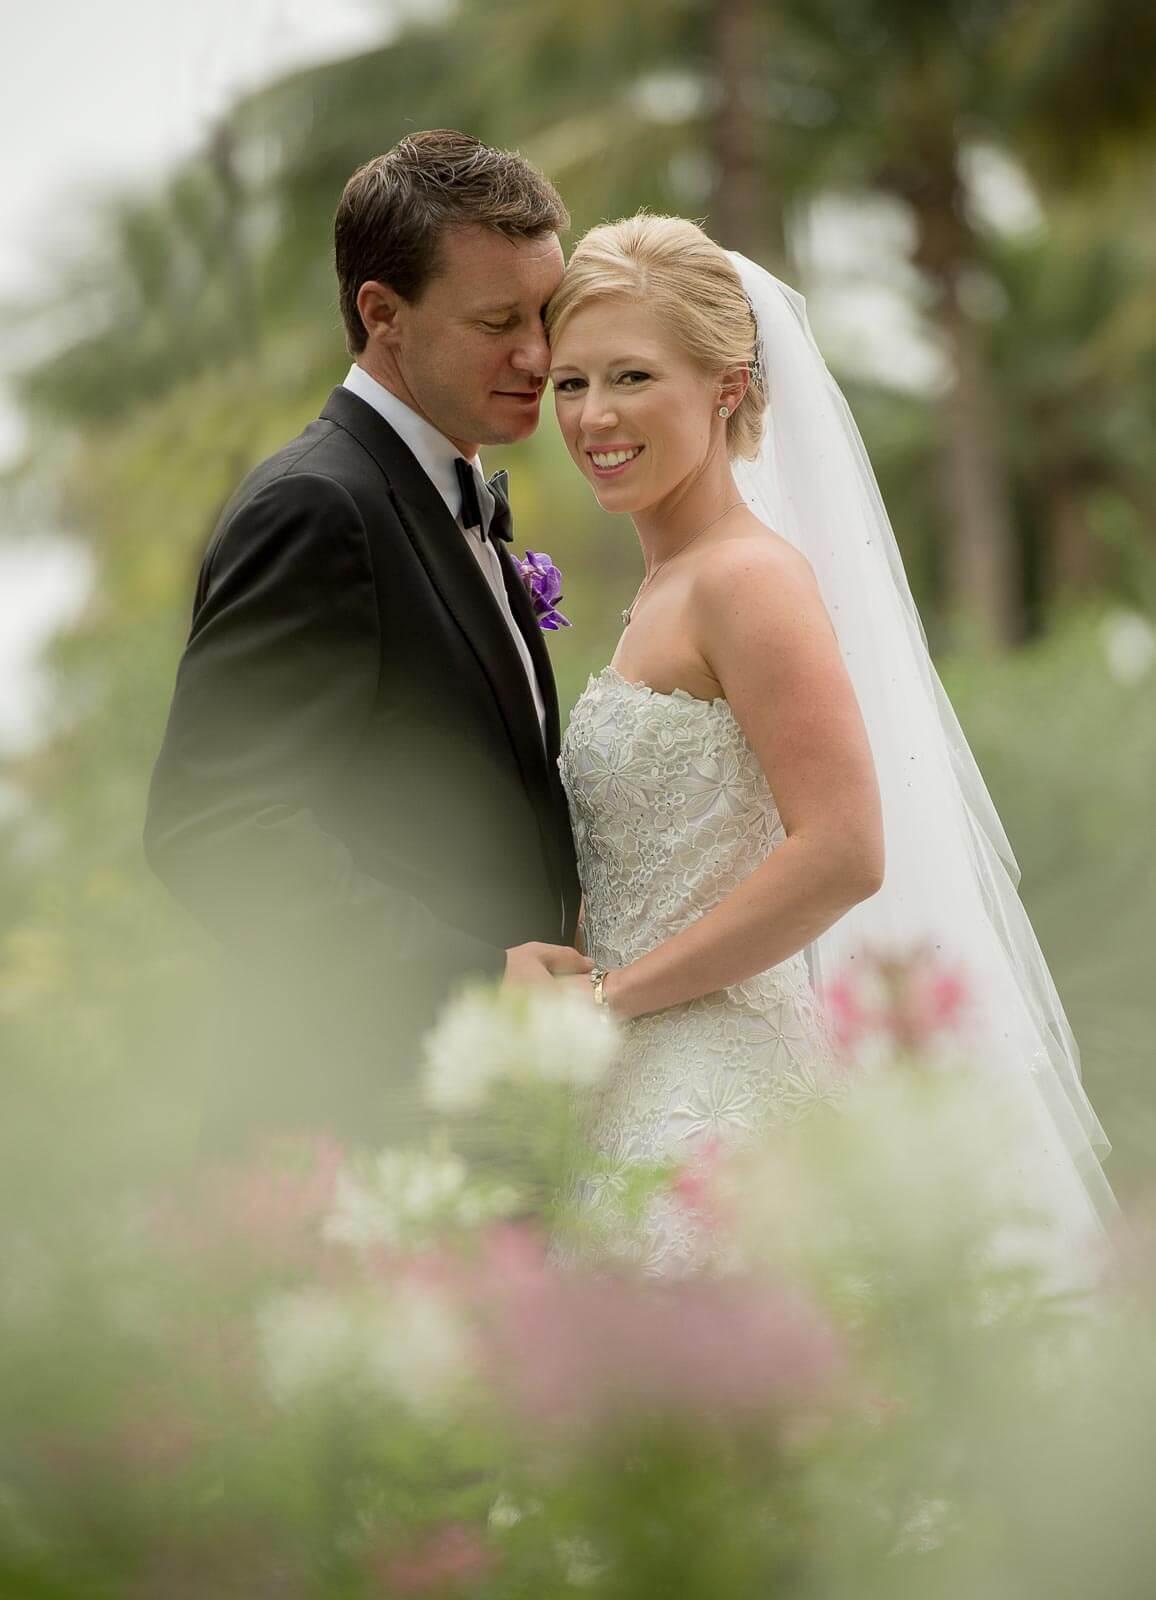 Luxurious Breakers Hotel Wedding